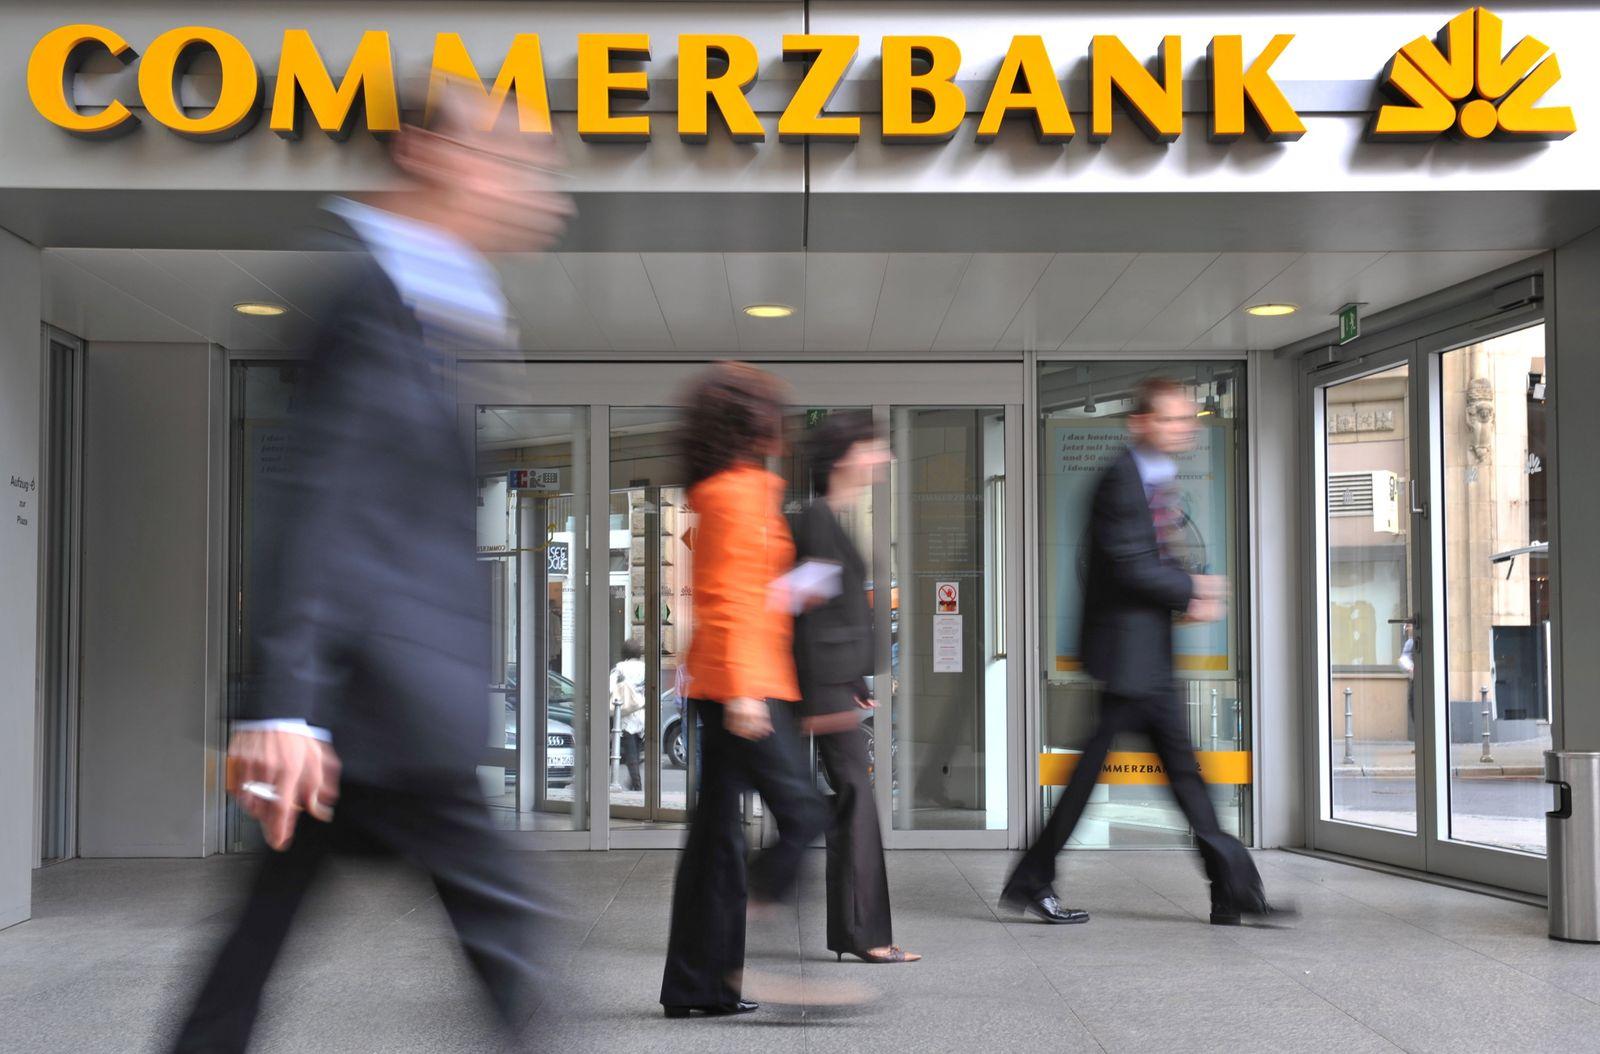 Commerzbank Logo / Filiale